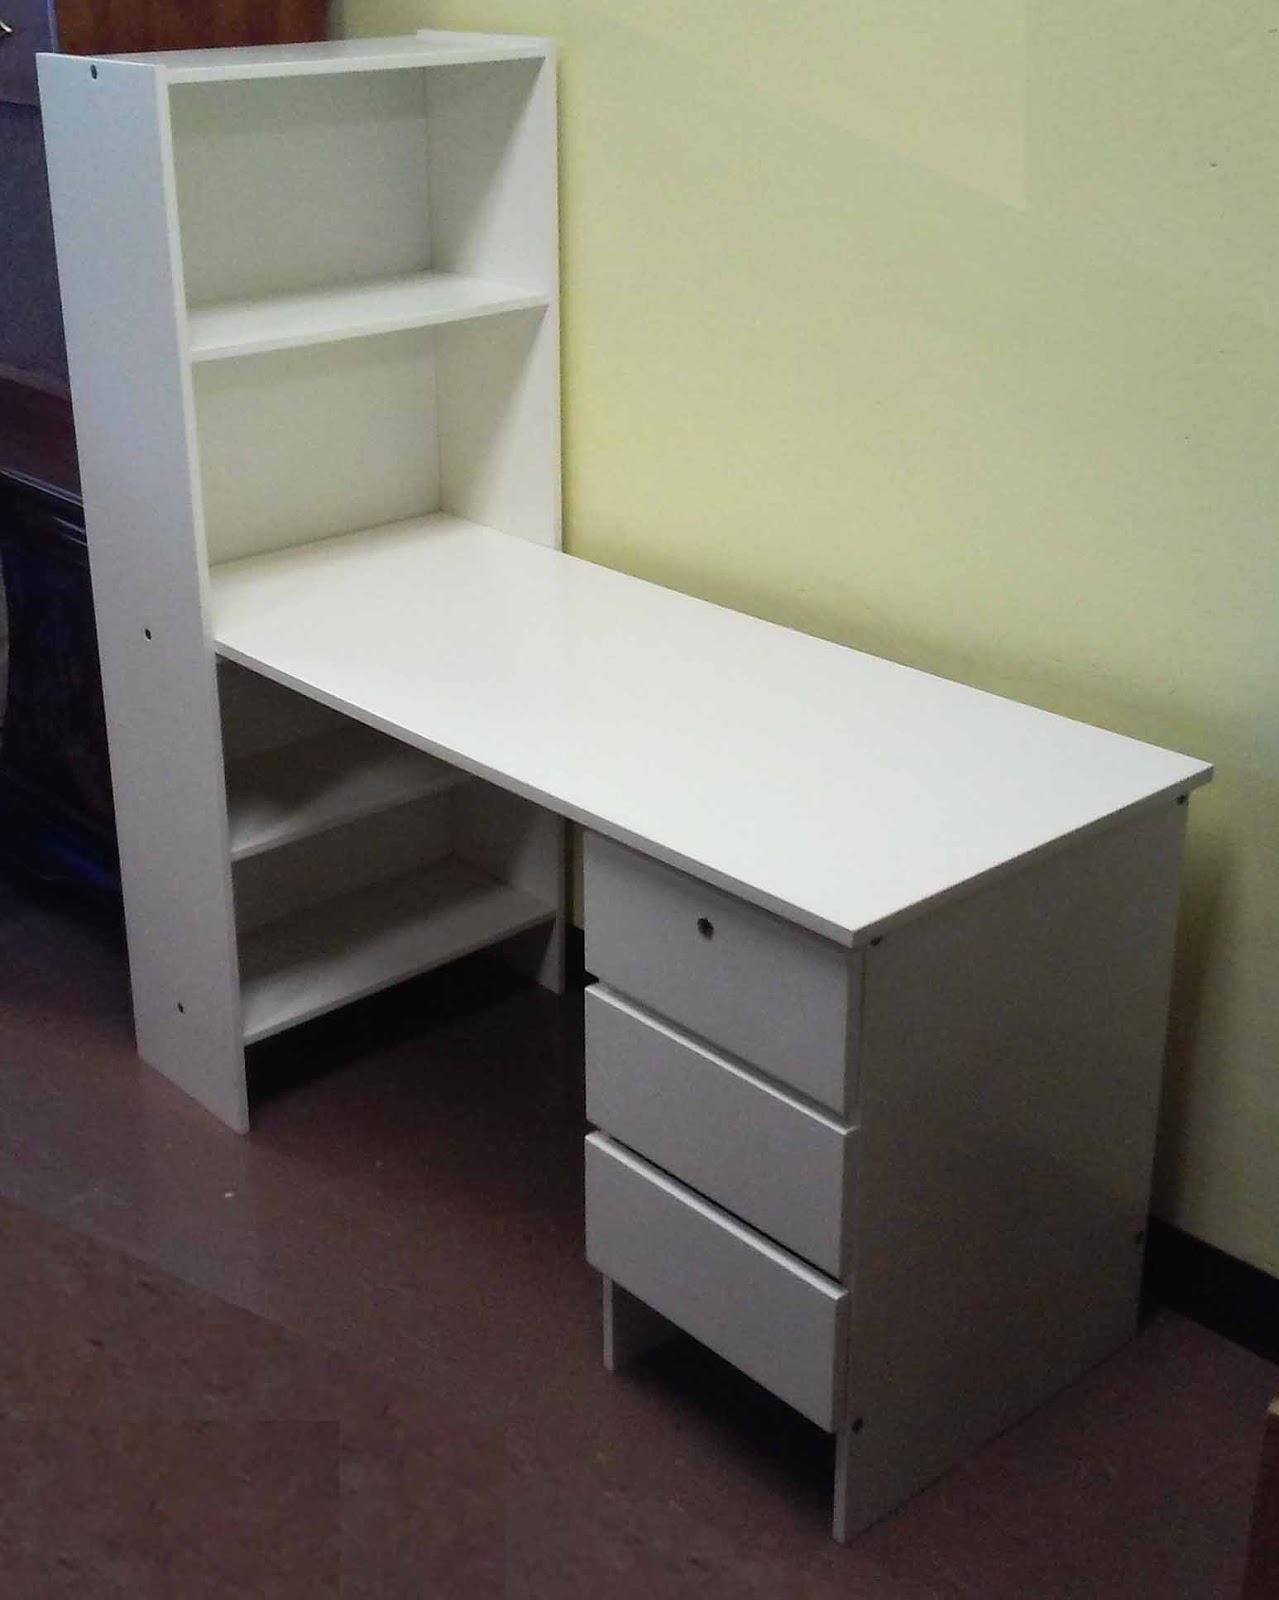 Uhuru Furniture Collectibles Sold White Shelf Desk Unit